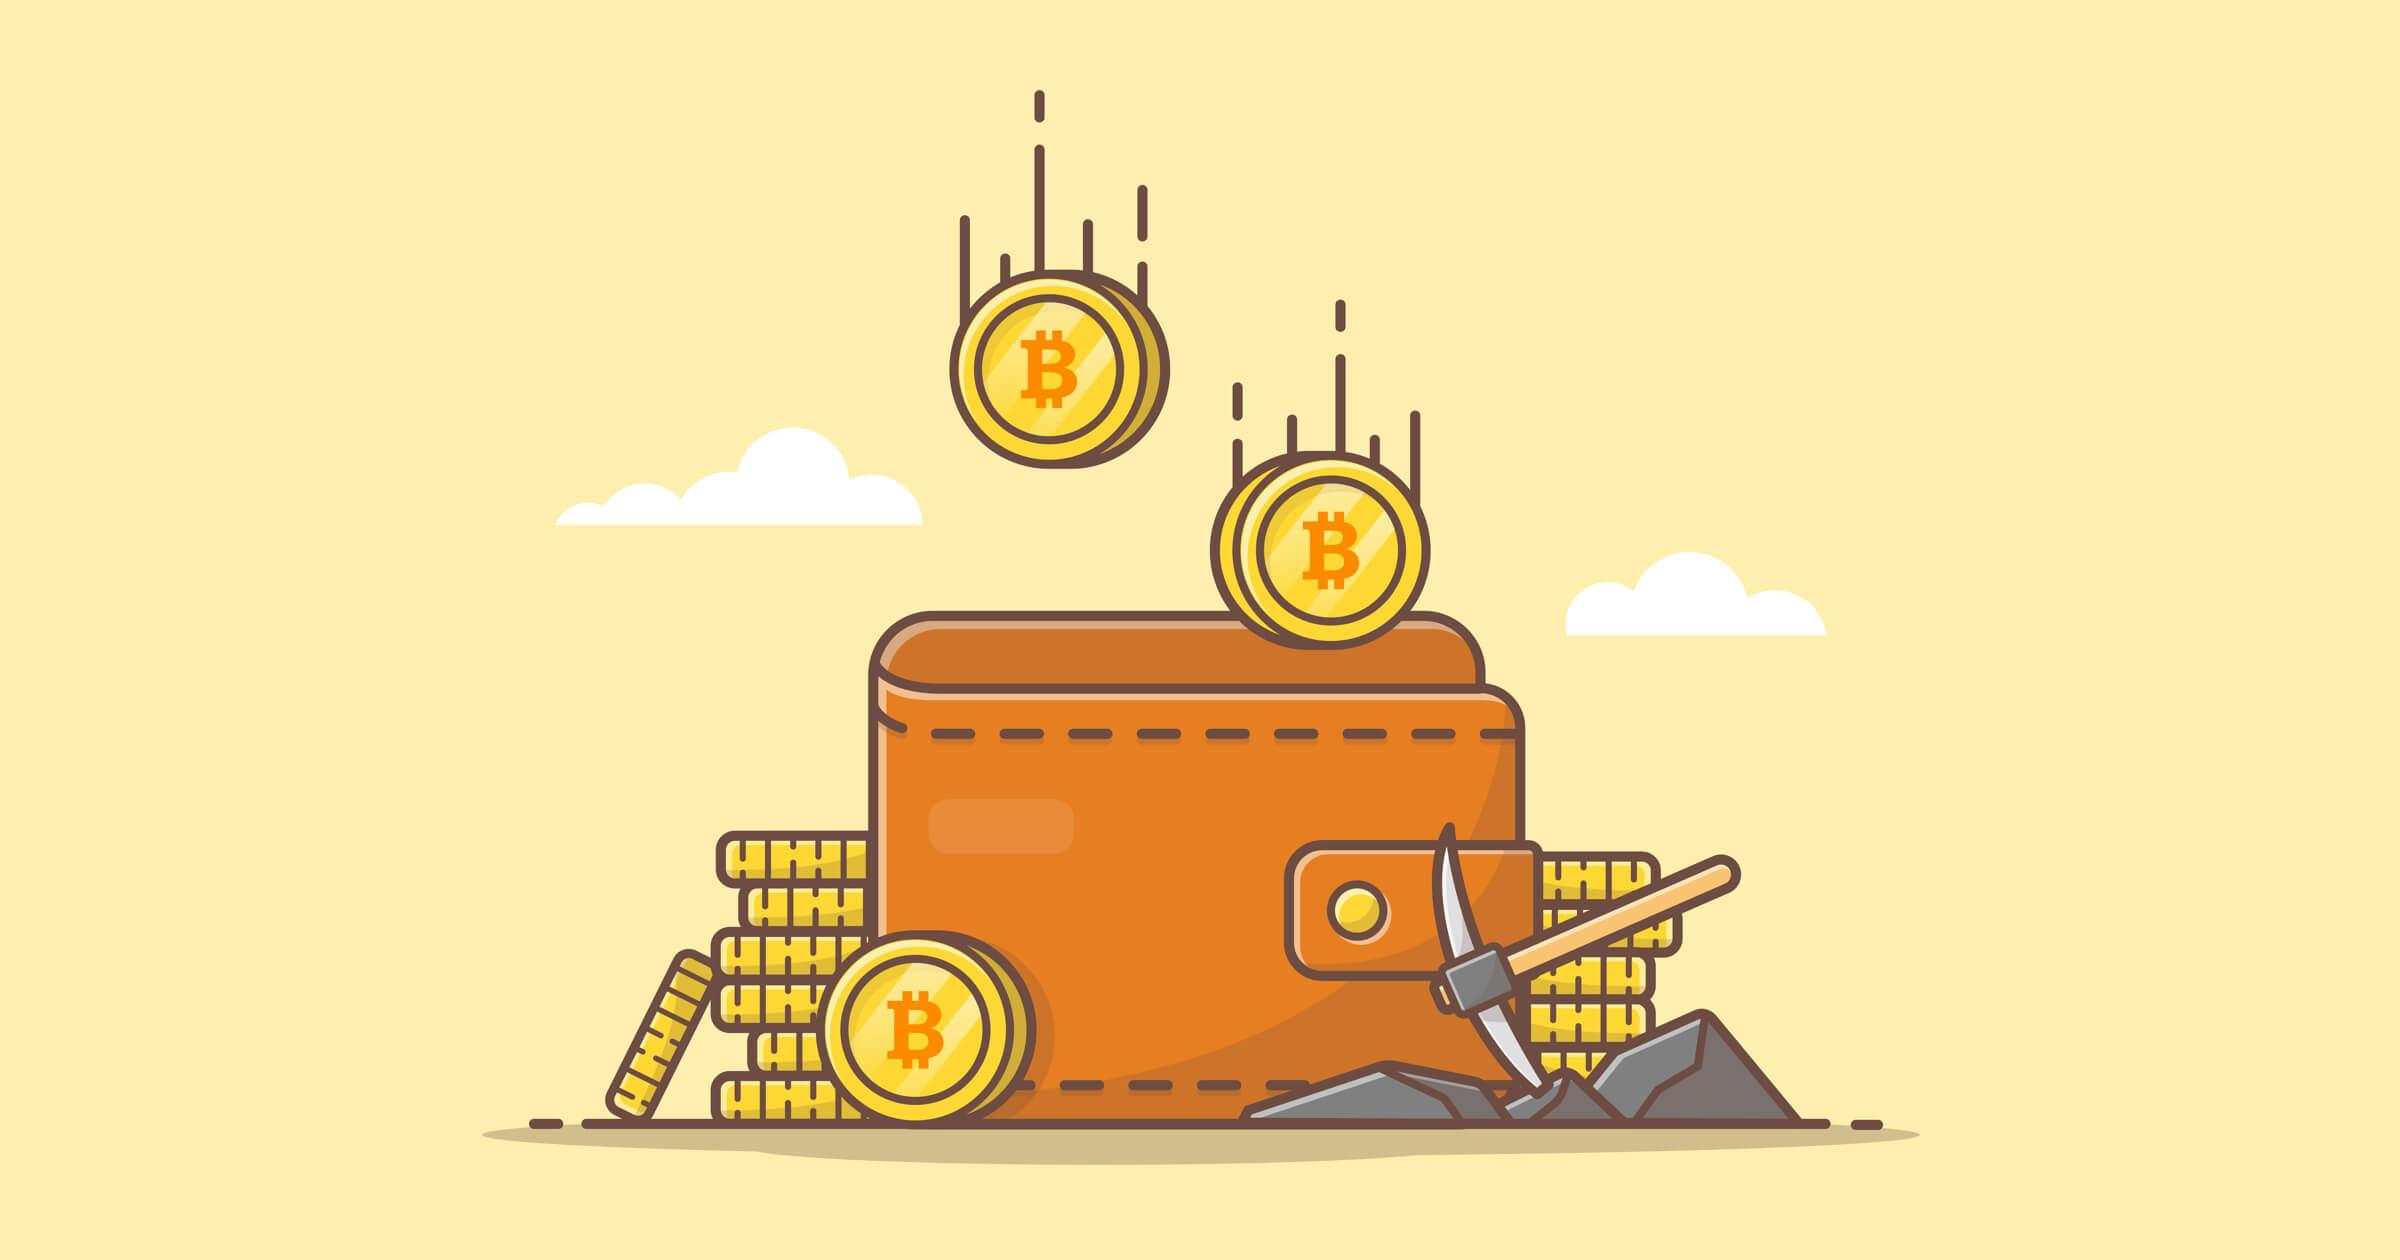 Investtor News: mercado de criptomoedas em novembro e dezembro de 2019